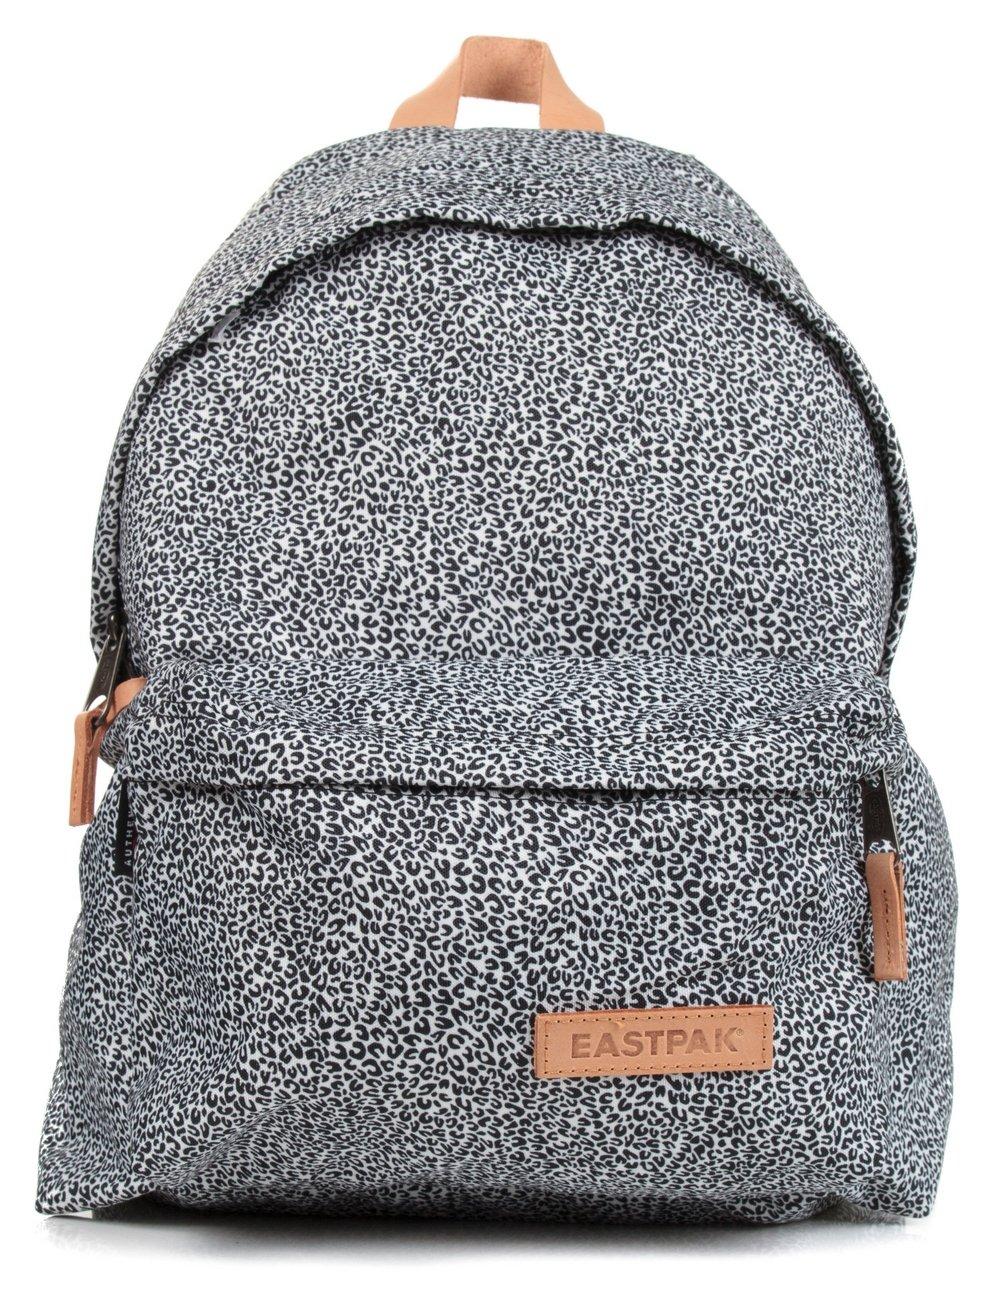 Eastpak Padded Pak R Backpack Black: Eastpak From Fat Buddha